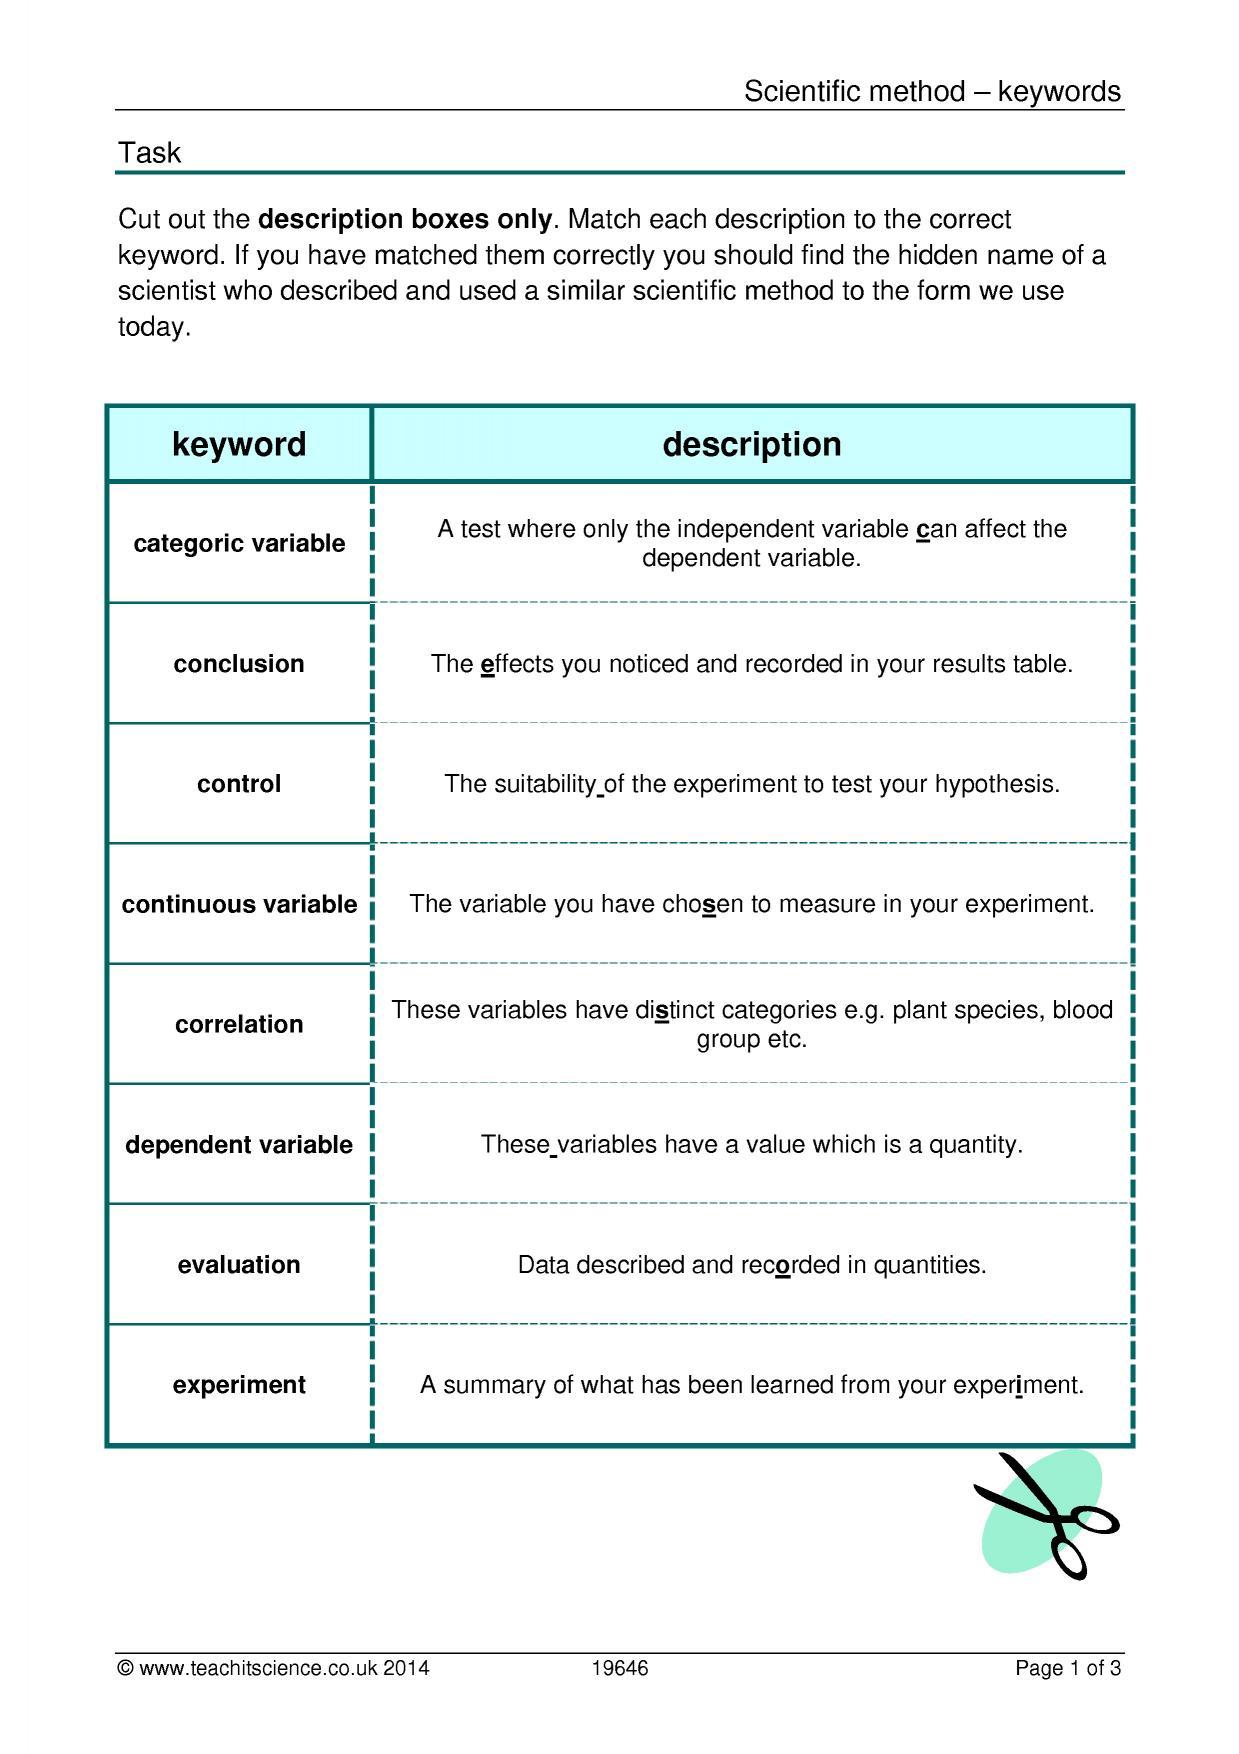 Scientific Method Keywords